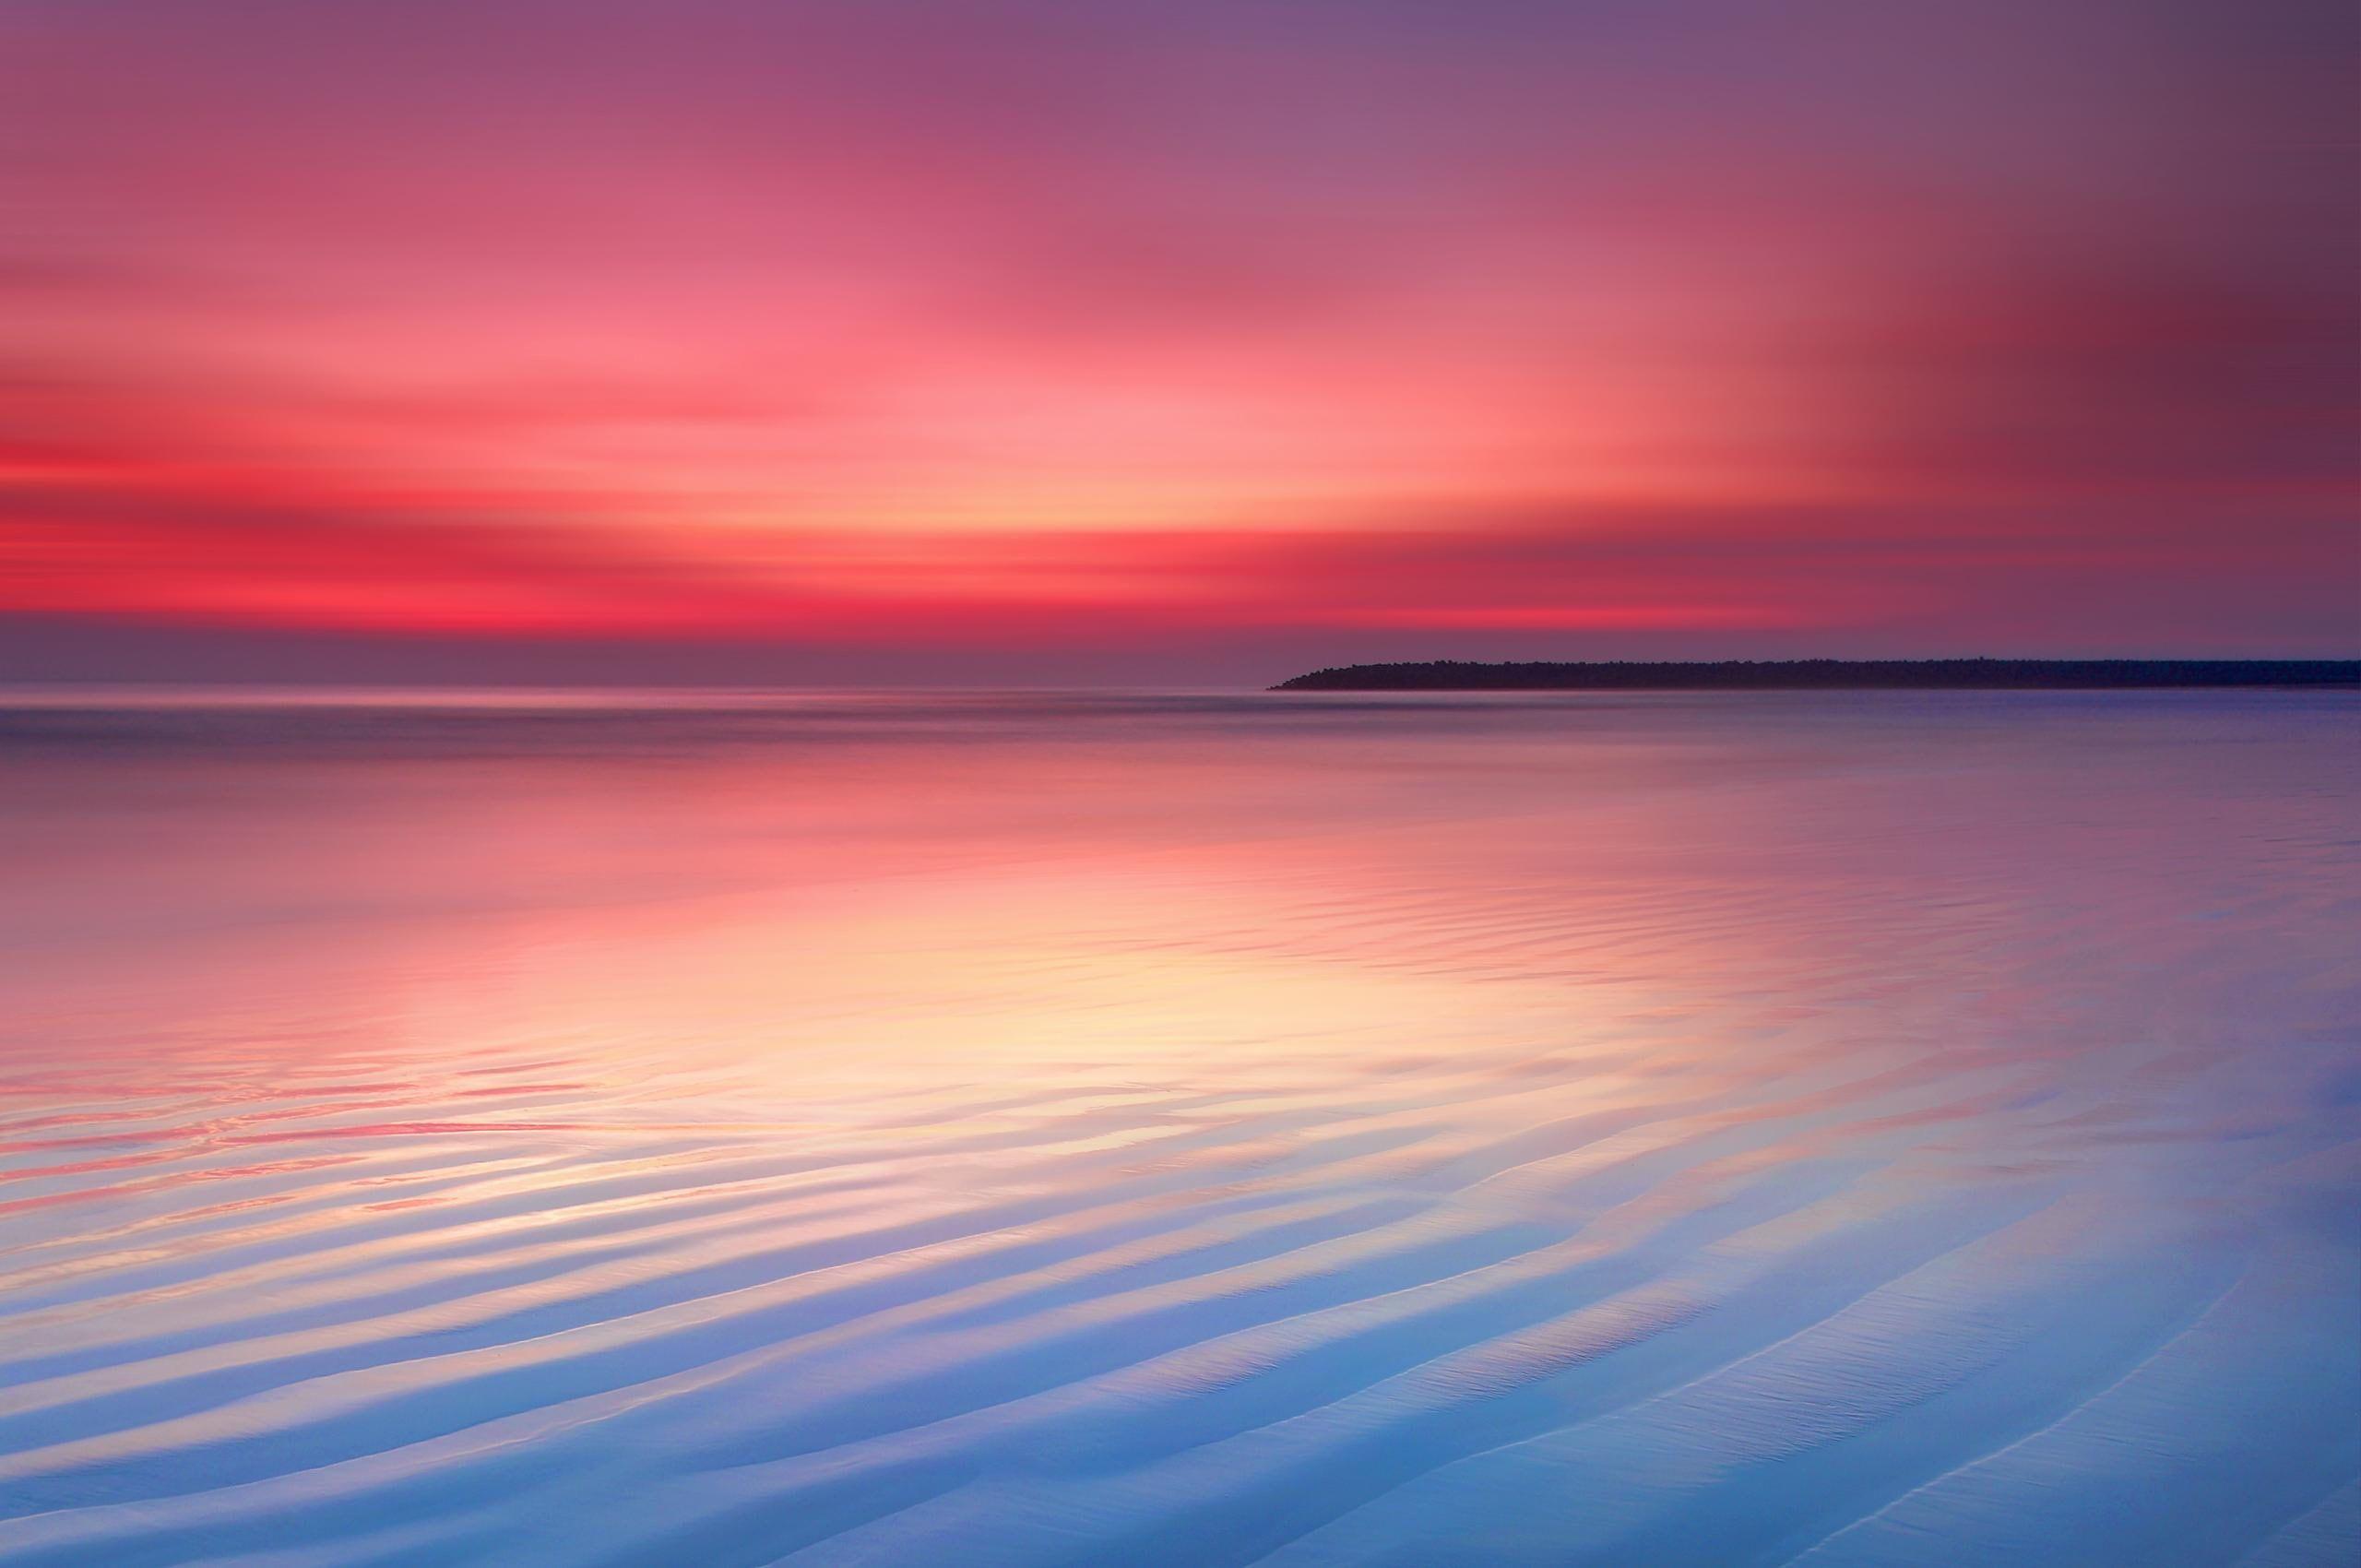 Dusk Chrome Os Sunset Calm Seascape Stock 2k Wallpaper Hdwallpaper Desktop Sunset Wallpaper Chromebook Os Wallpaper